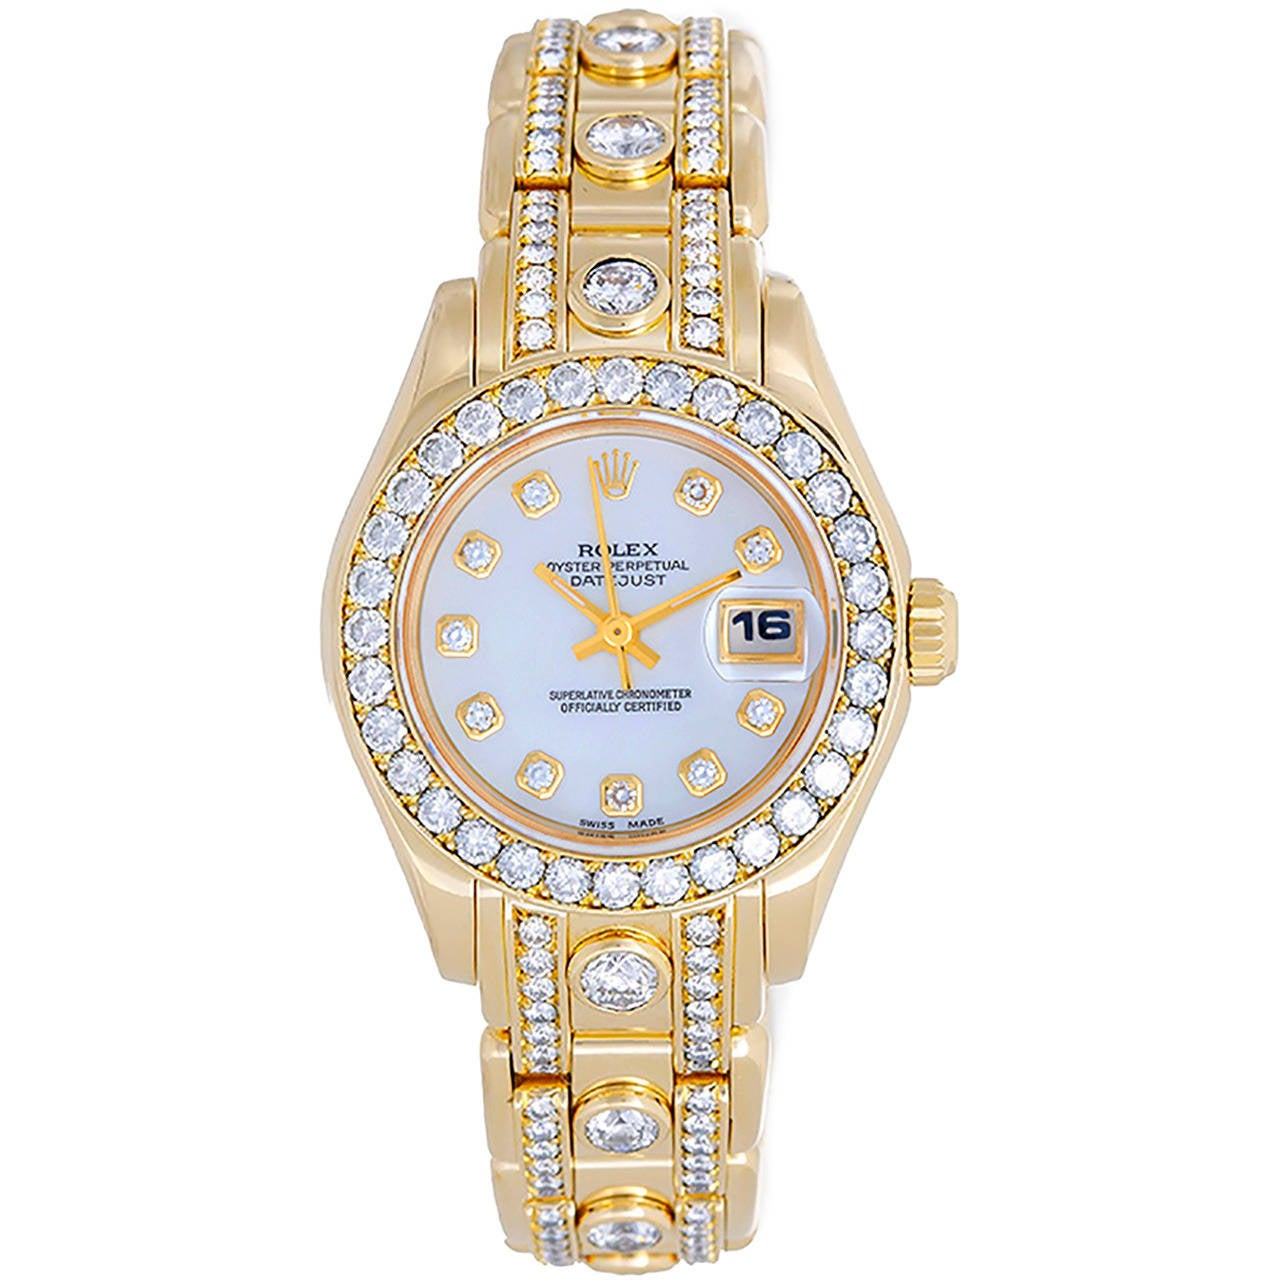 Rolex Lady's Yellow Gold Masterpiece Pearlmaster Diamond Wristwatch Ref 69298